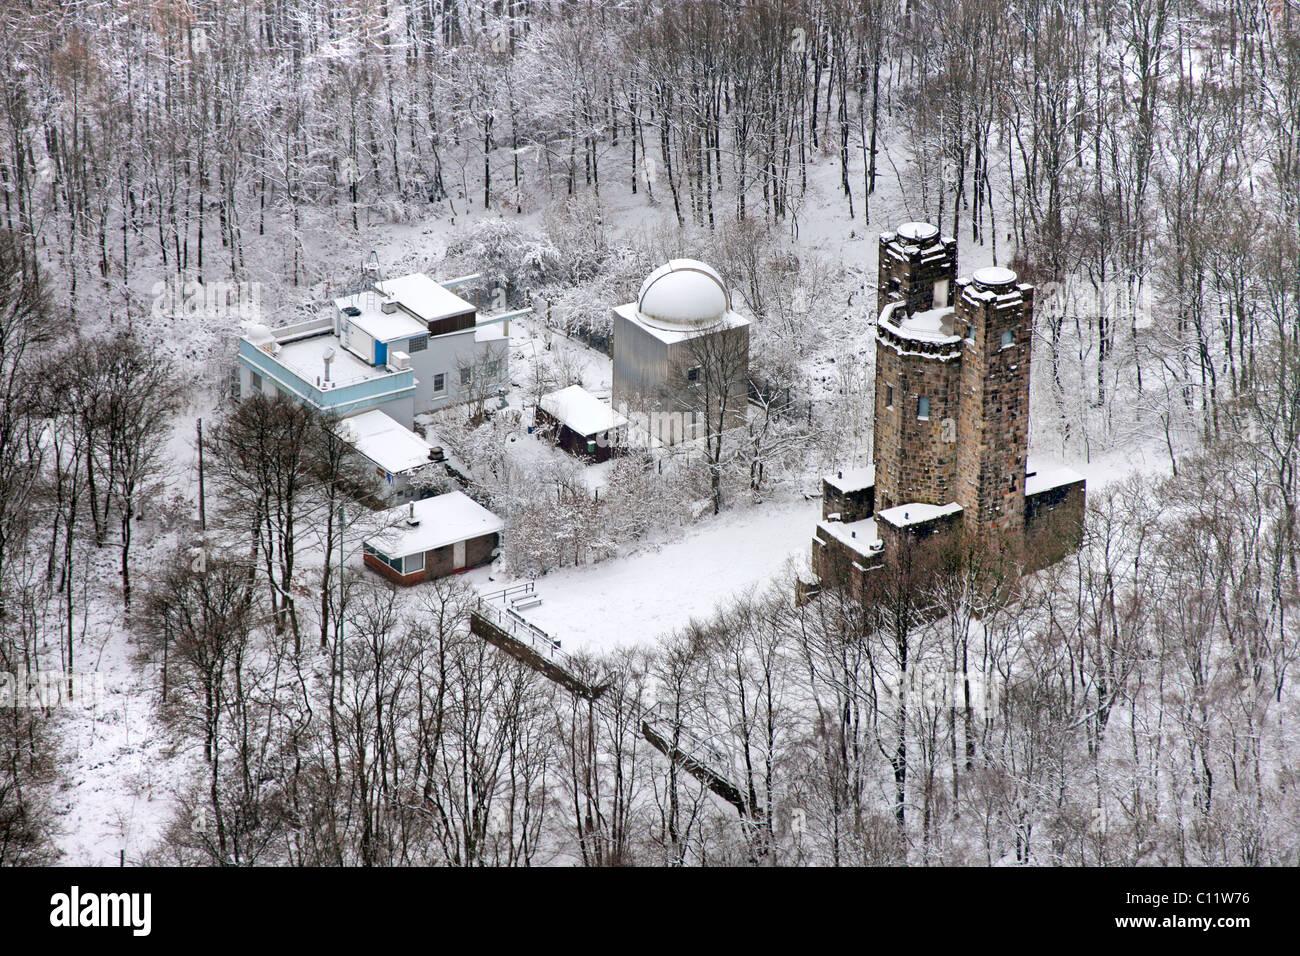 Aerial view, snow, Kipper, Sternwarte Hagen observatory, Hagen, North Rhine-Westphalia, Germany, Europe - Stock Image